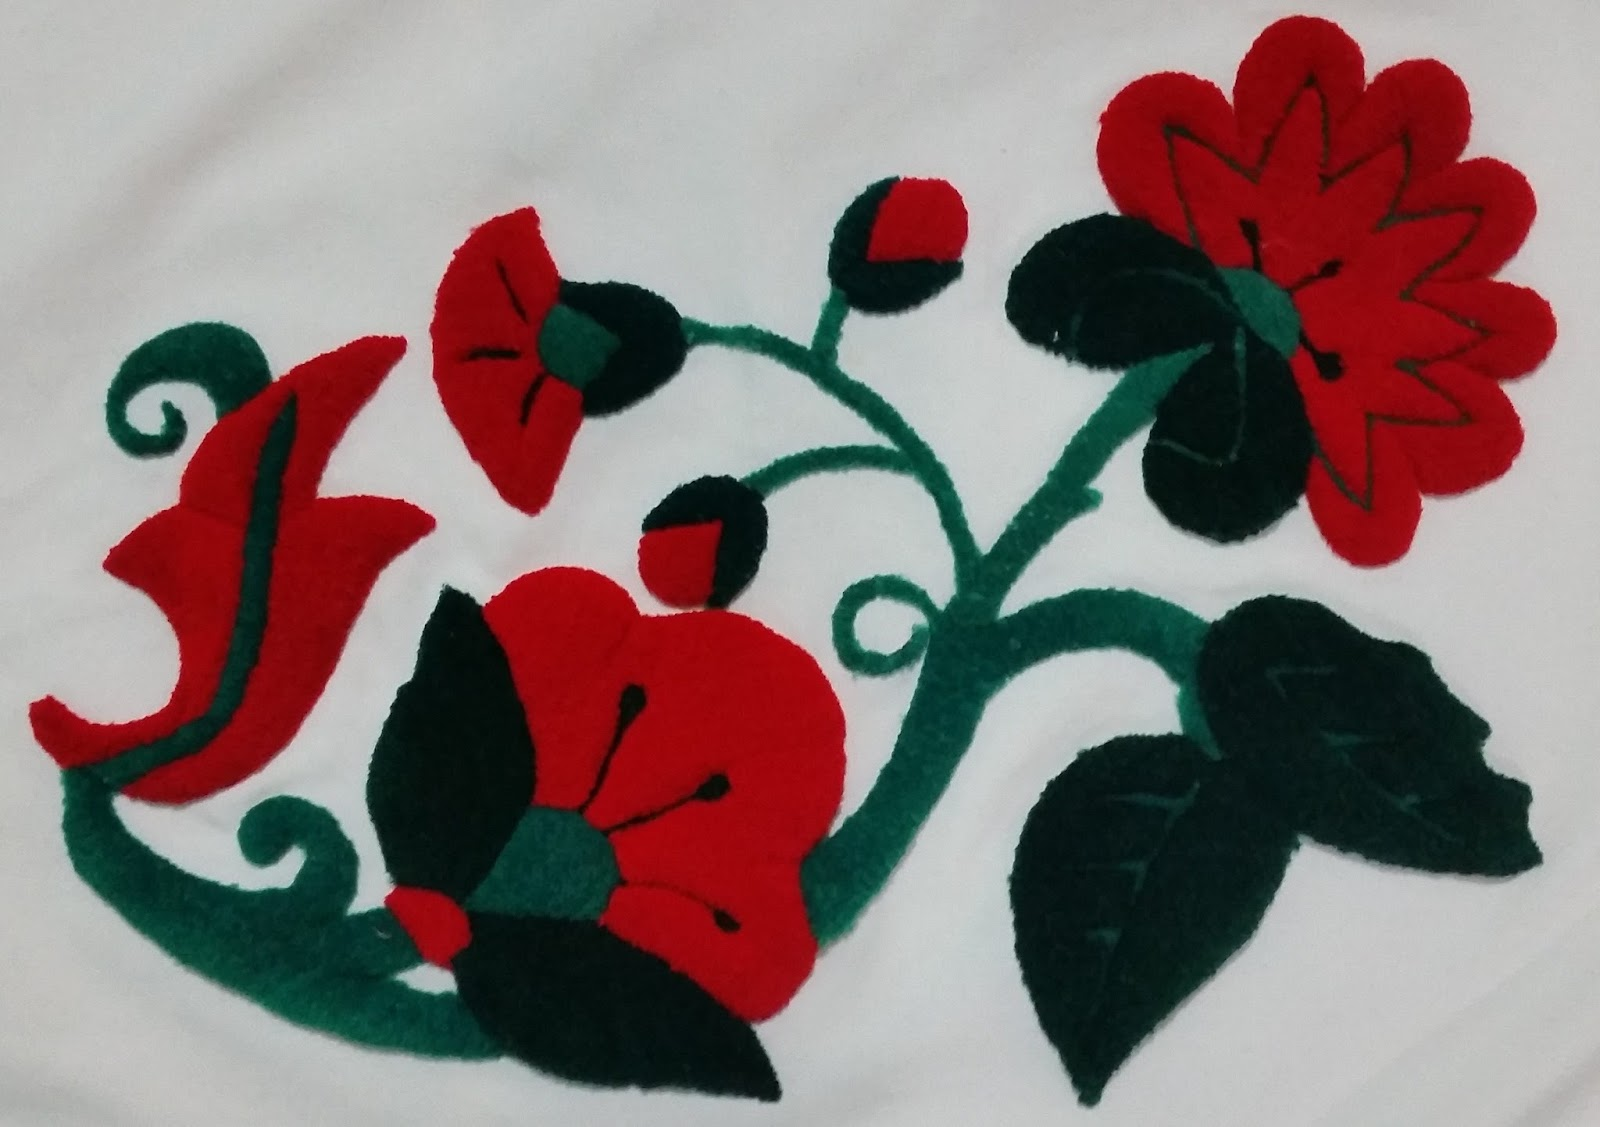 Creaciones cail flores bordados en alto relieve con sus respectivos jpg  1600x1127 Bordado de flores alto e5ee0af0eb5